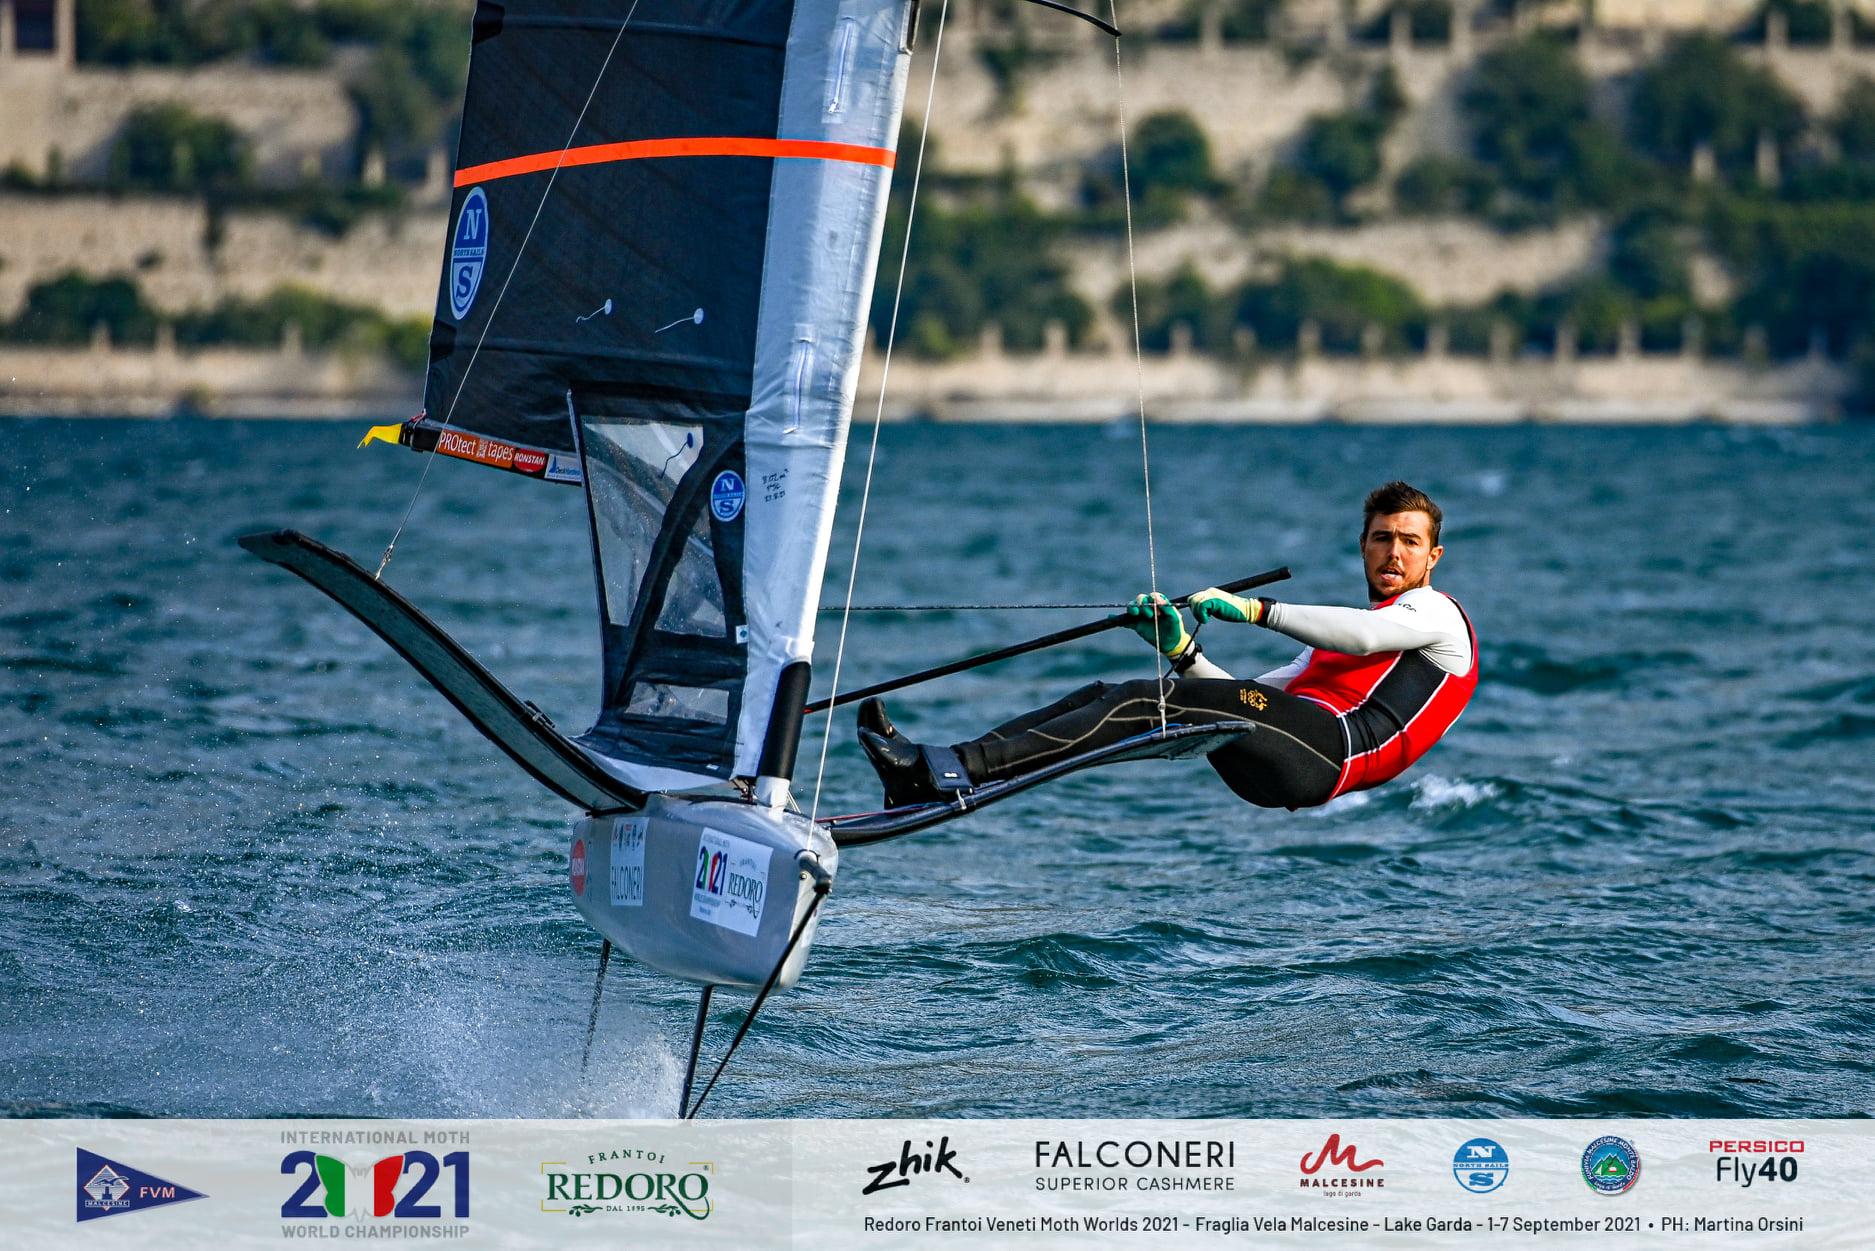 Iain Jensen sailing upwind.